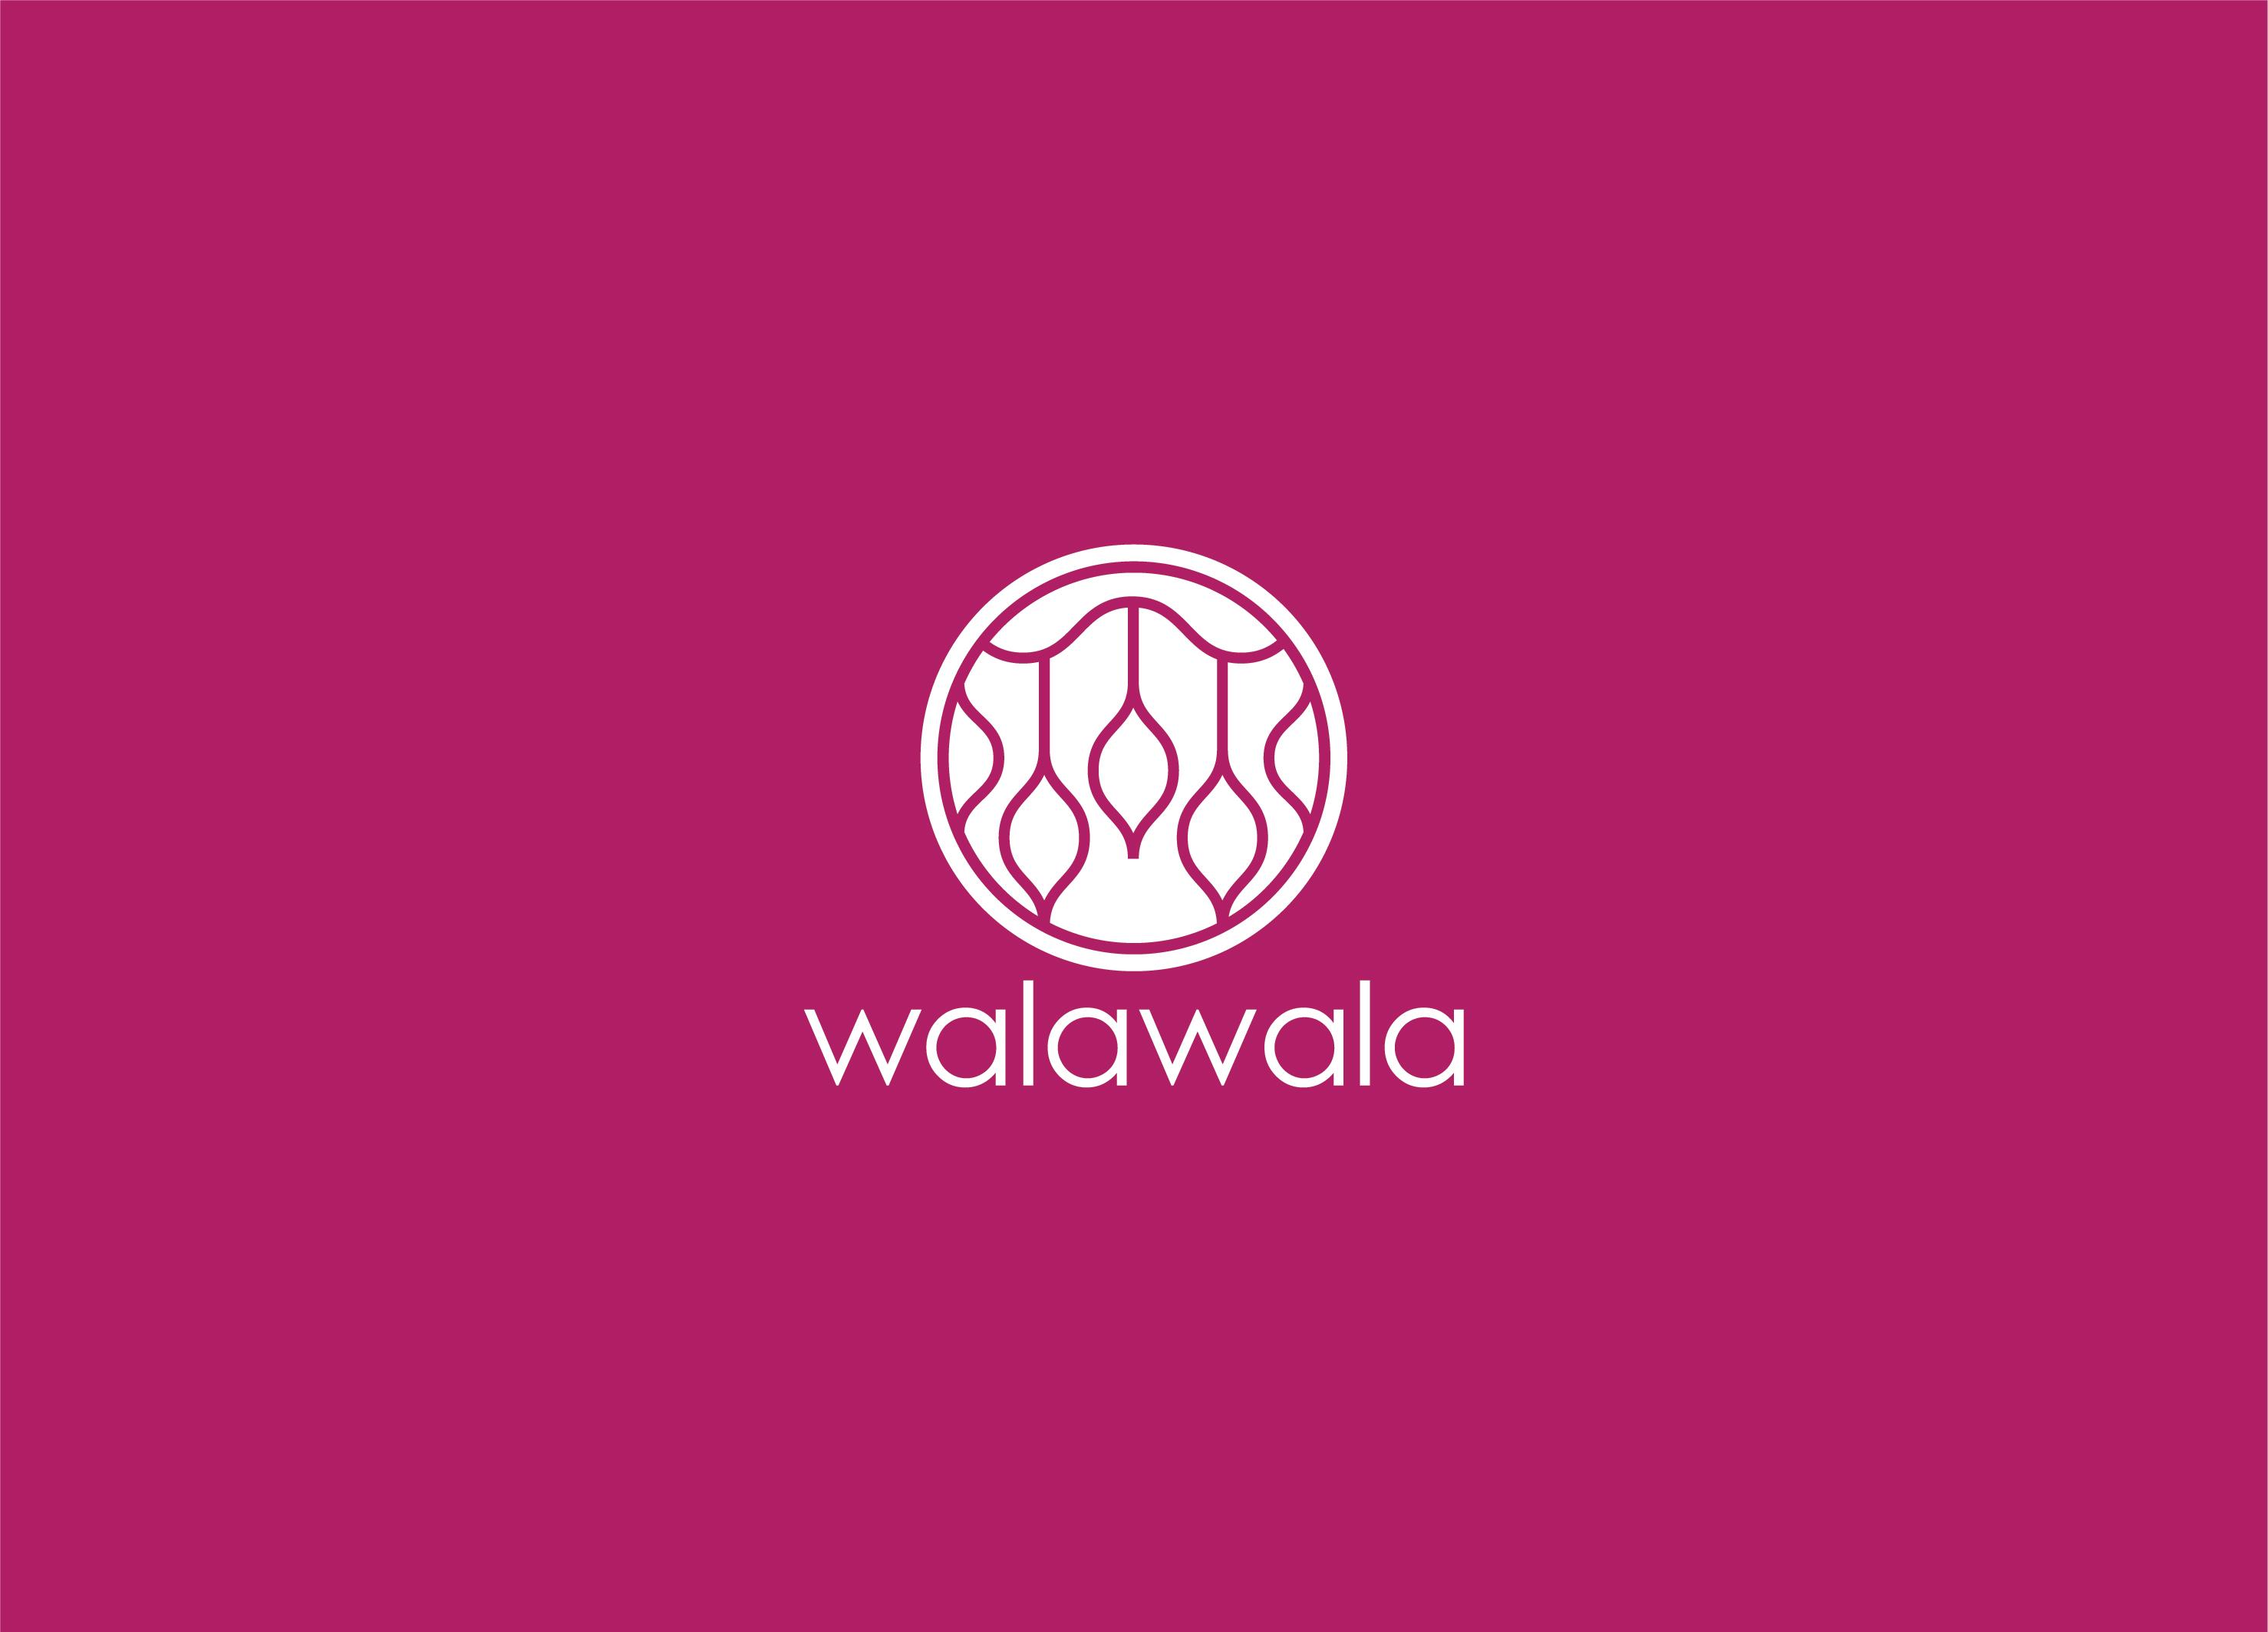 WALAWALA SWEET POTATO